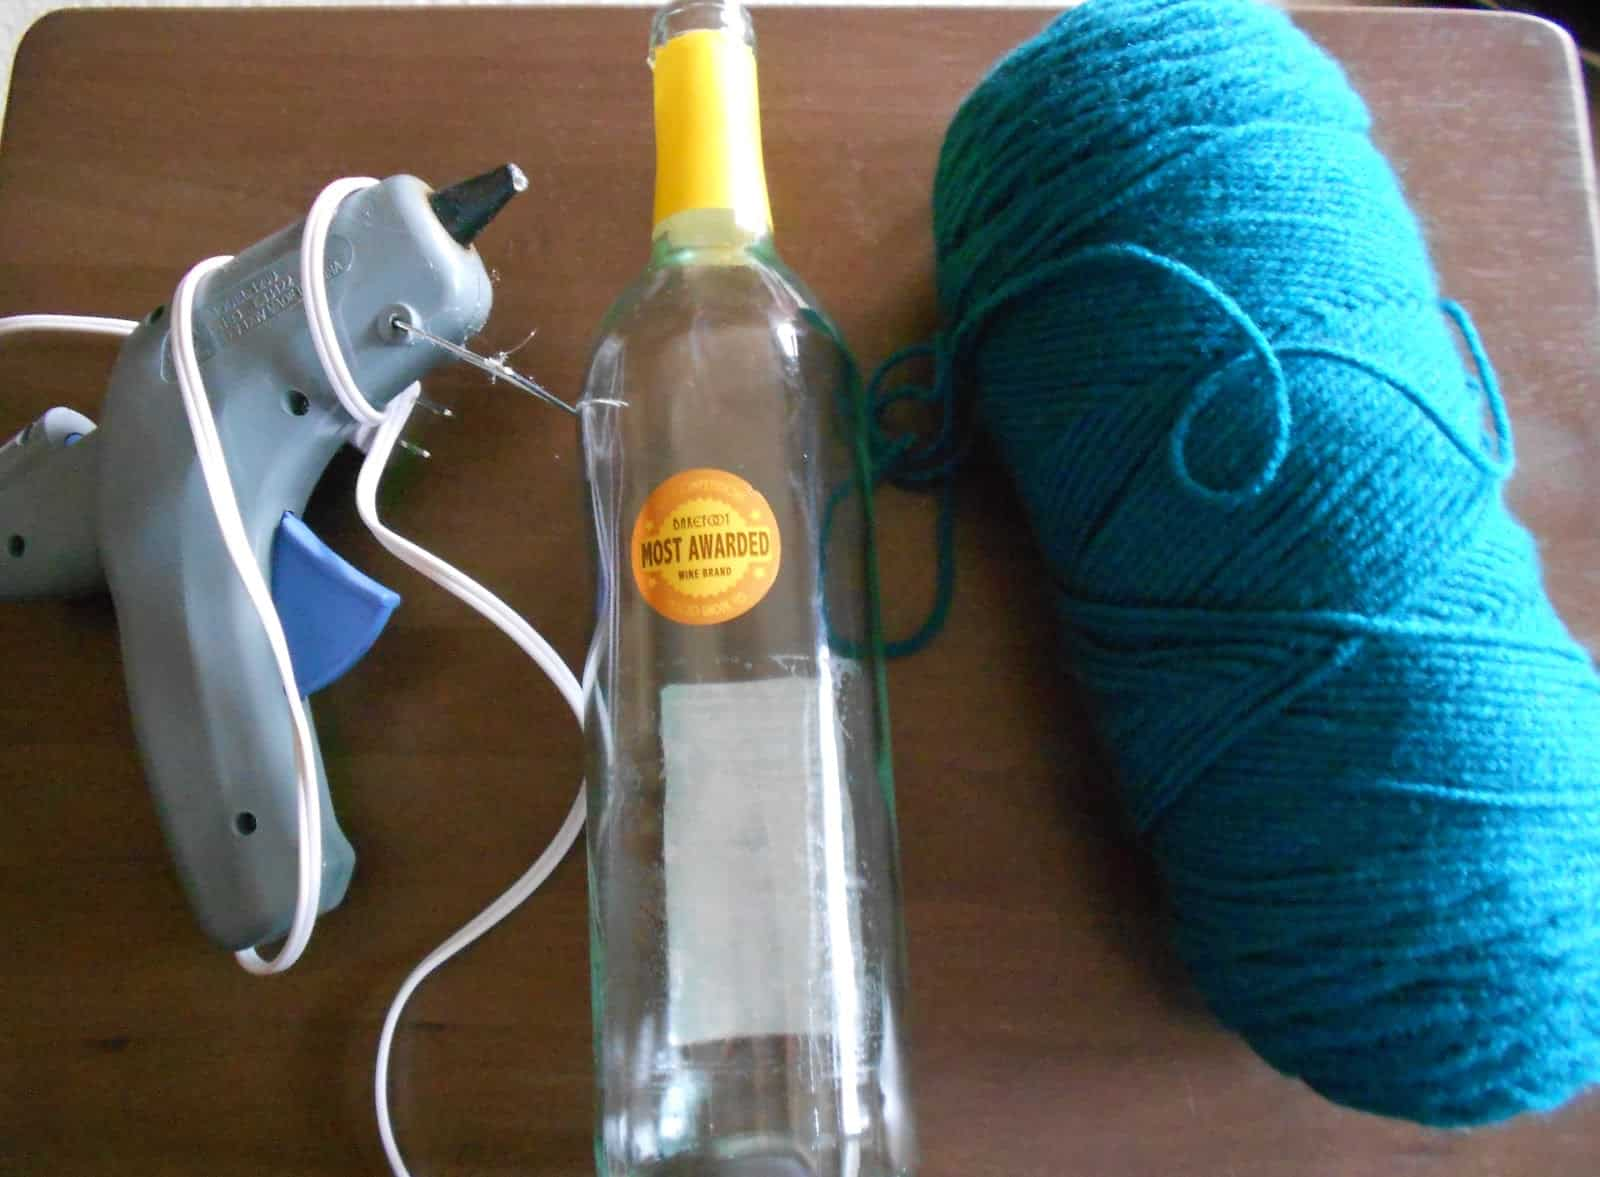 Painted wine bottle, yarn, and hot glue decor